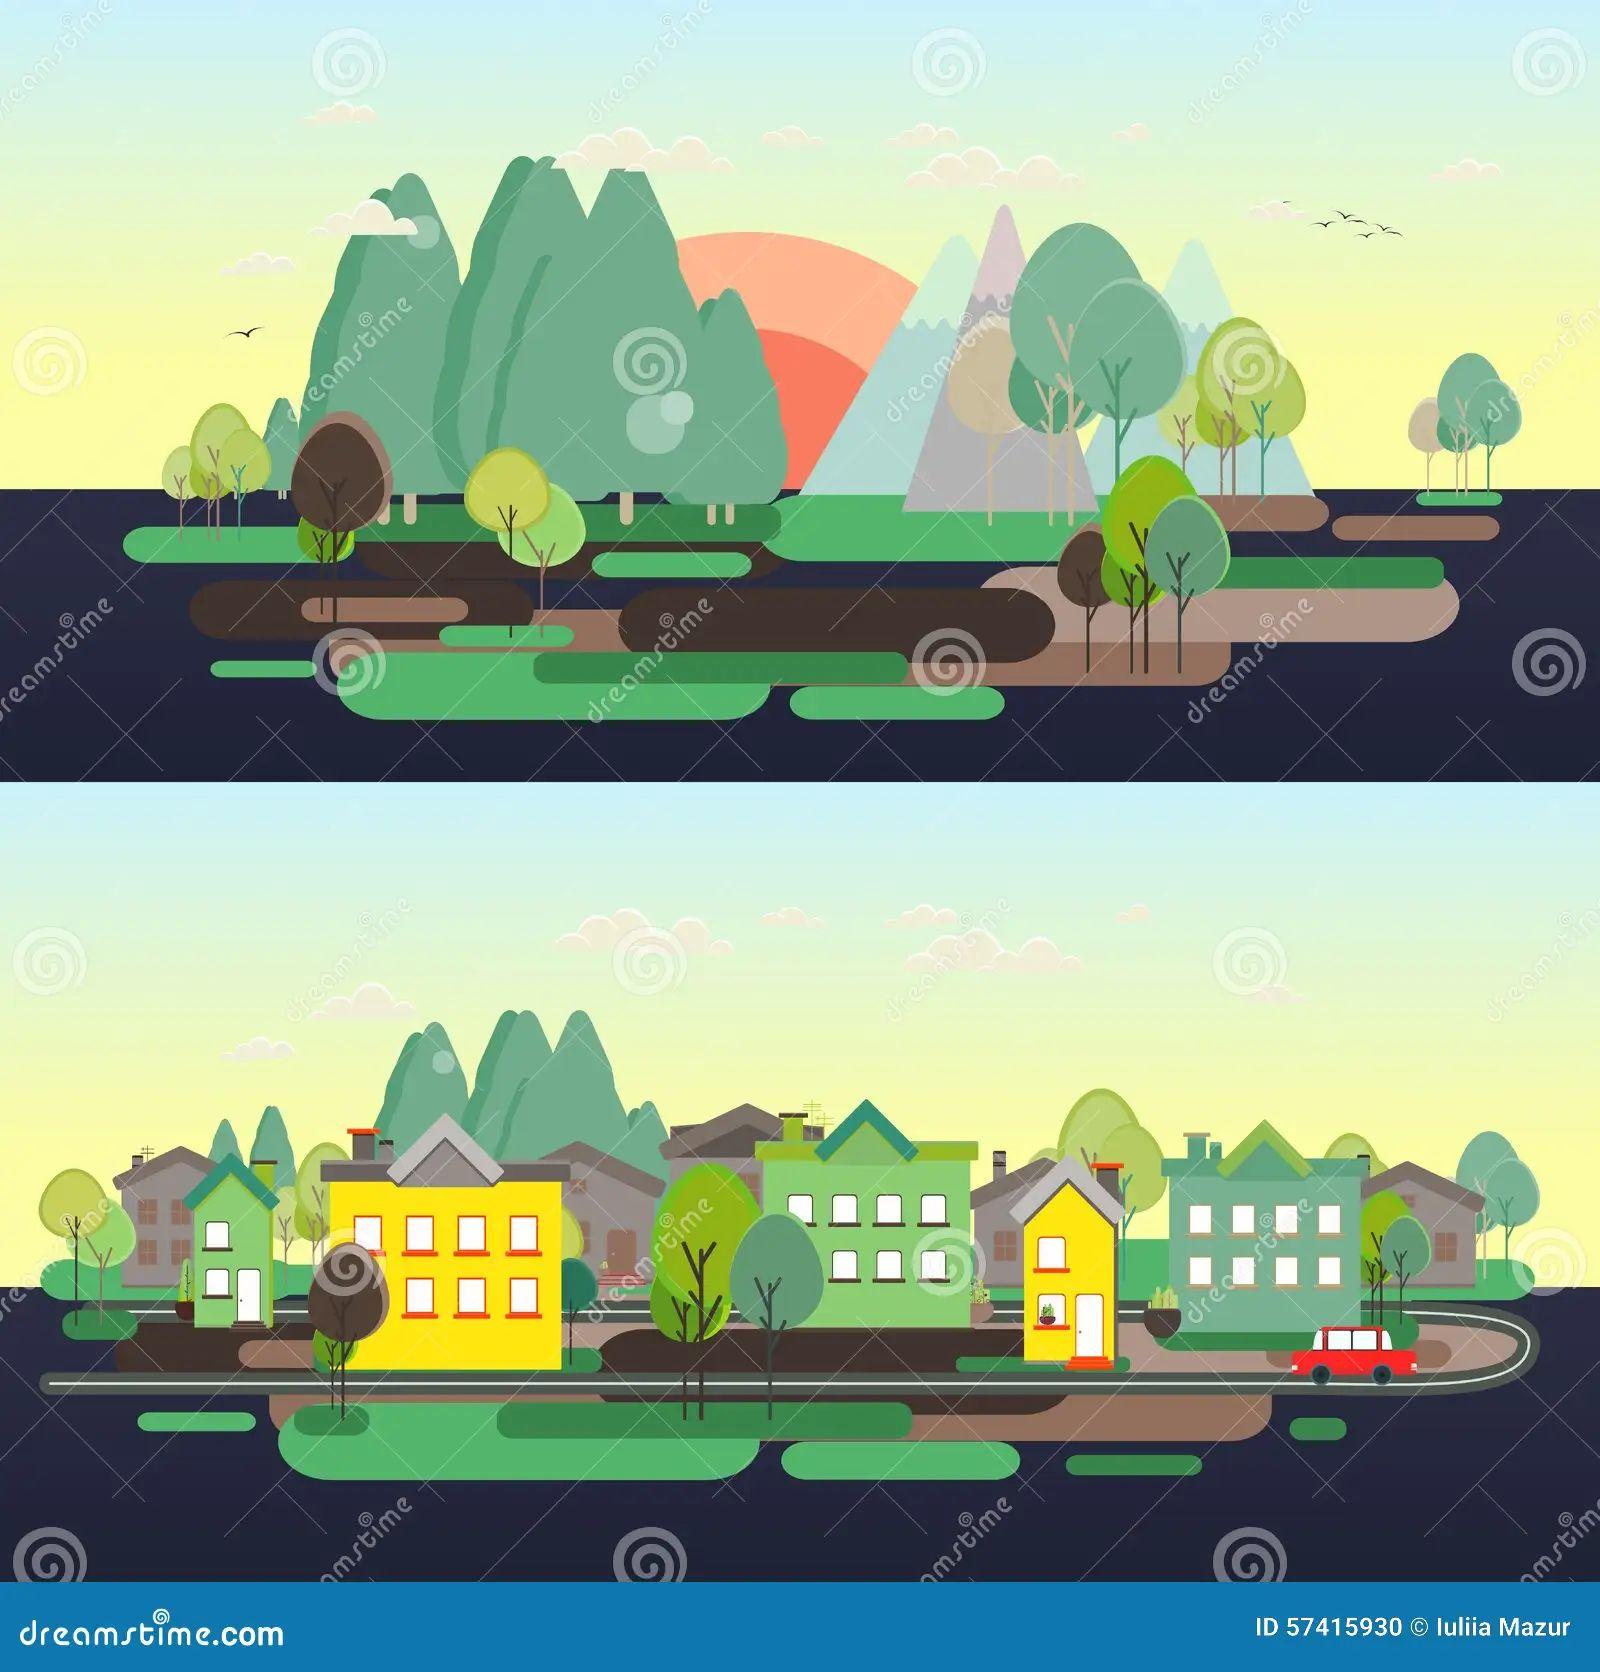 Poster design nature - Download